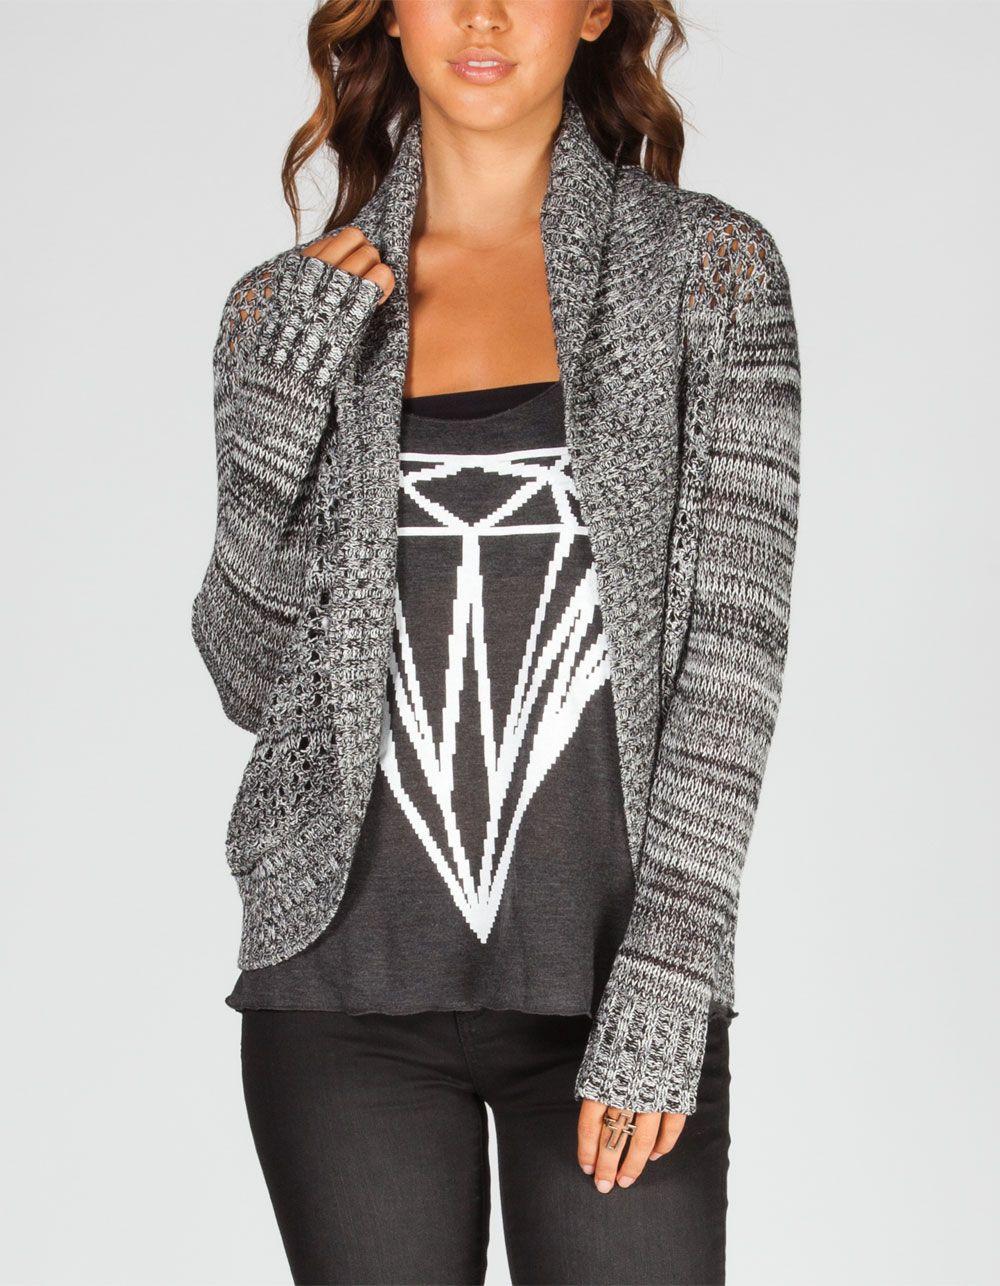 ELEMENT Tilda Womens Cardigan 216982100 | Sweaters & Cardigans ...